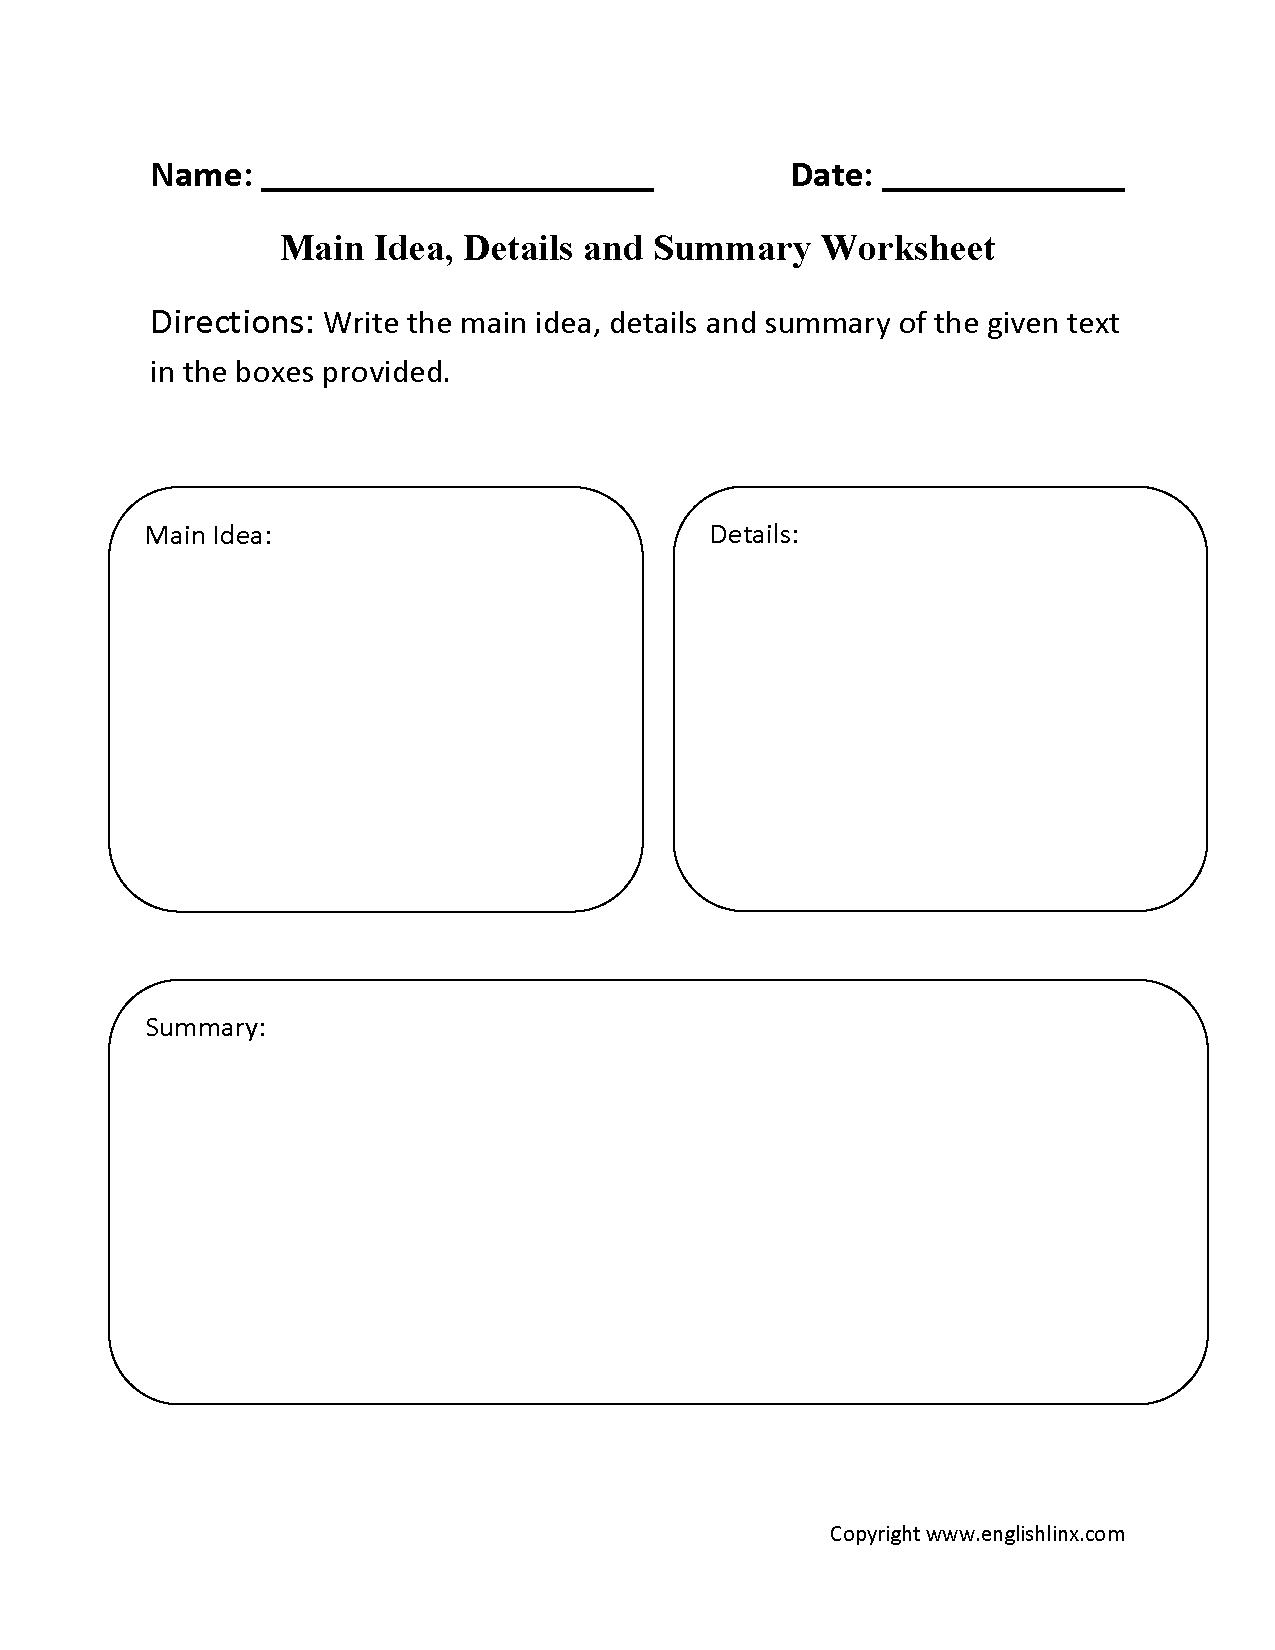 worksheet Main Idea Worksheets 1st Grade main idea details and summary worksheet englishlinx com board worksheet